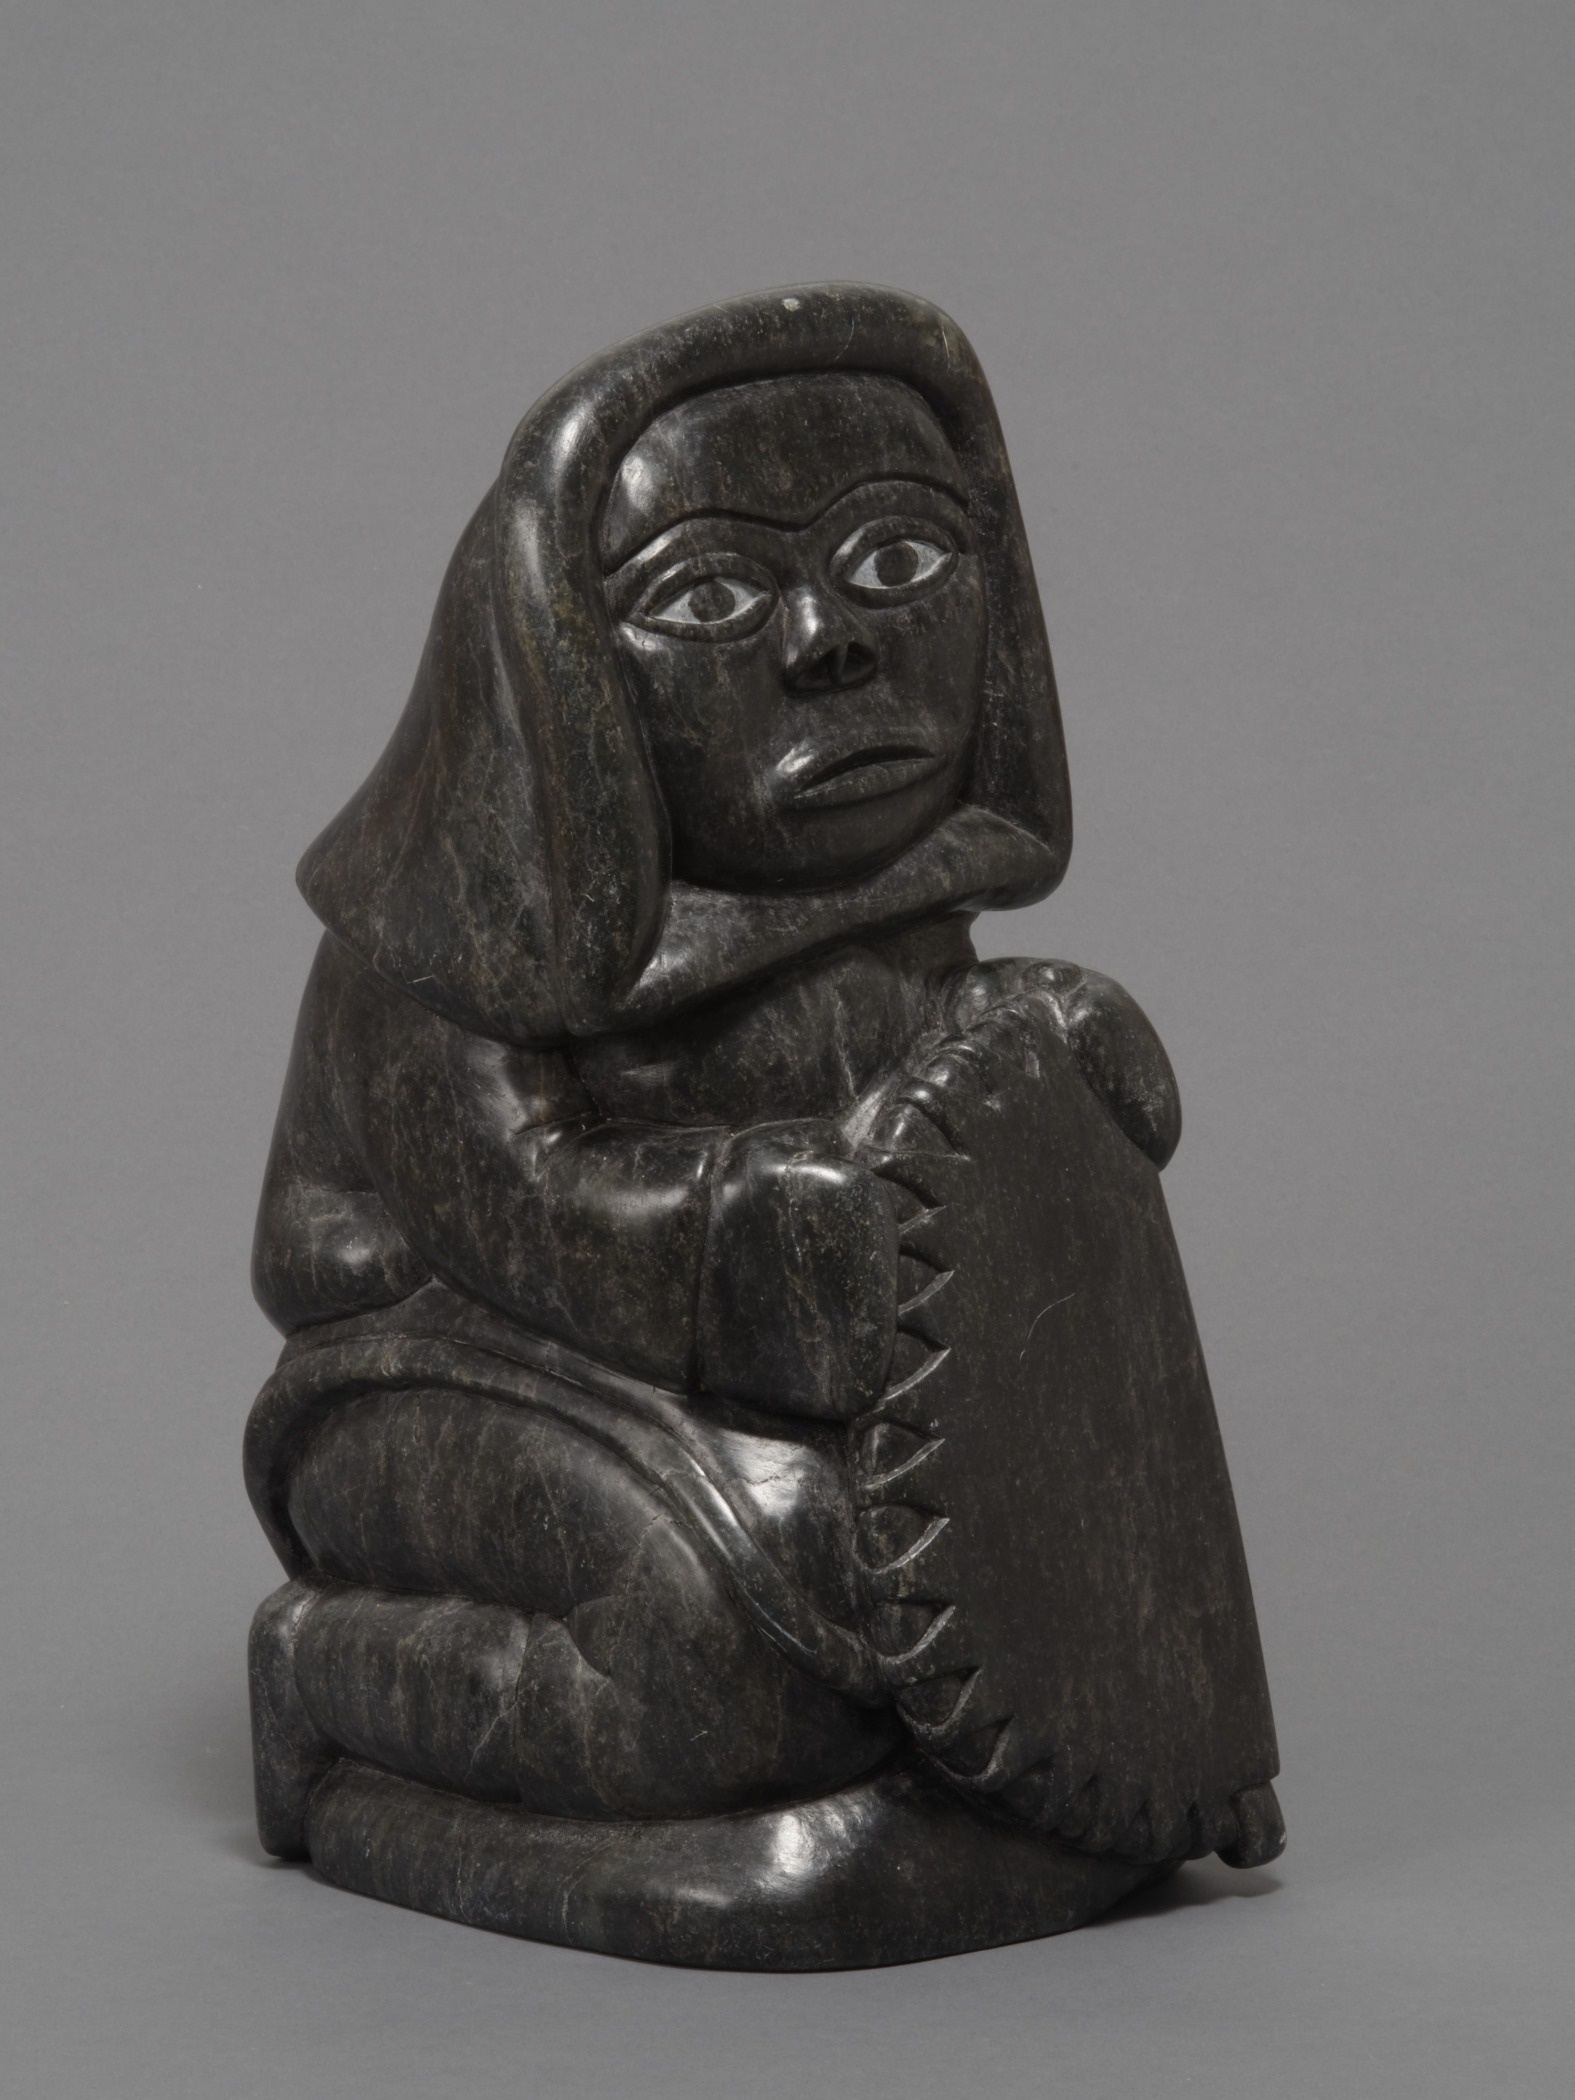 Abraham Pov, Canadian (Inuit; Povungnituk [Puvirnituq] / Inukjuak), 1927–1994,  Woman , 1982. Steatite stone, 13 3/4 × 5 7/8 × 6 11/16 in. Hood Museum of Art, Dartmouth College: Gift of Jane and Raphael Bernstein; 2011.64.35.